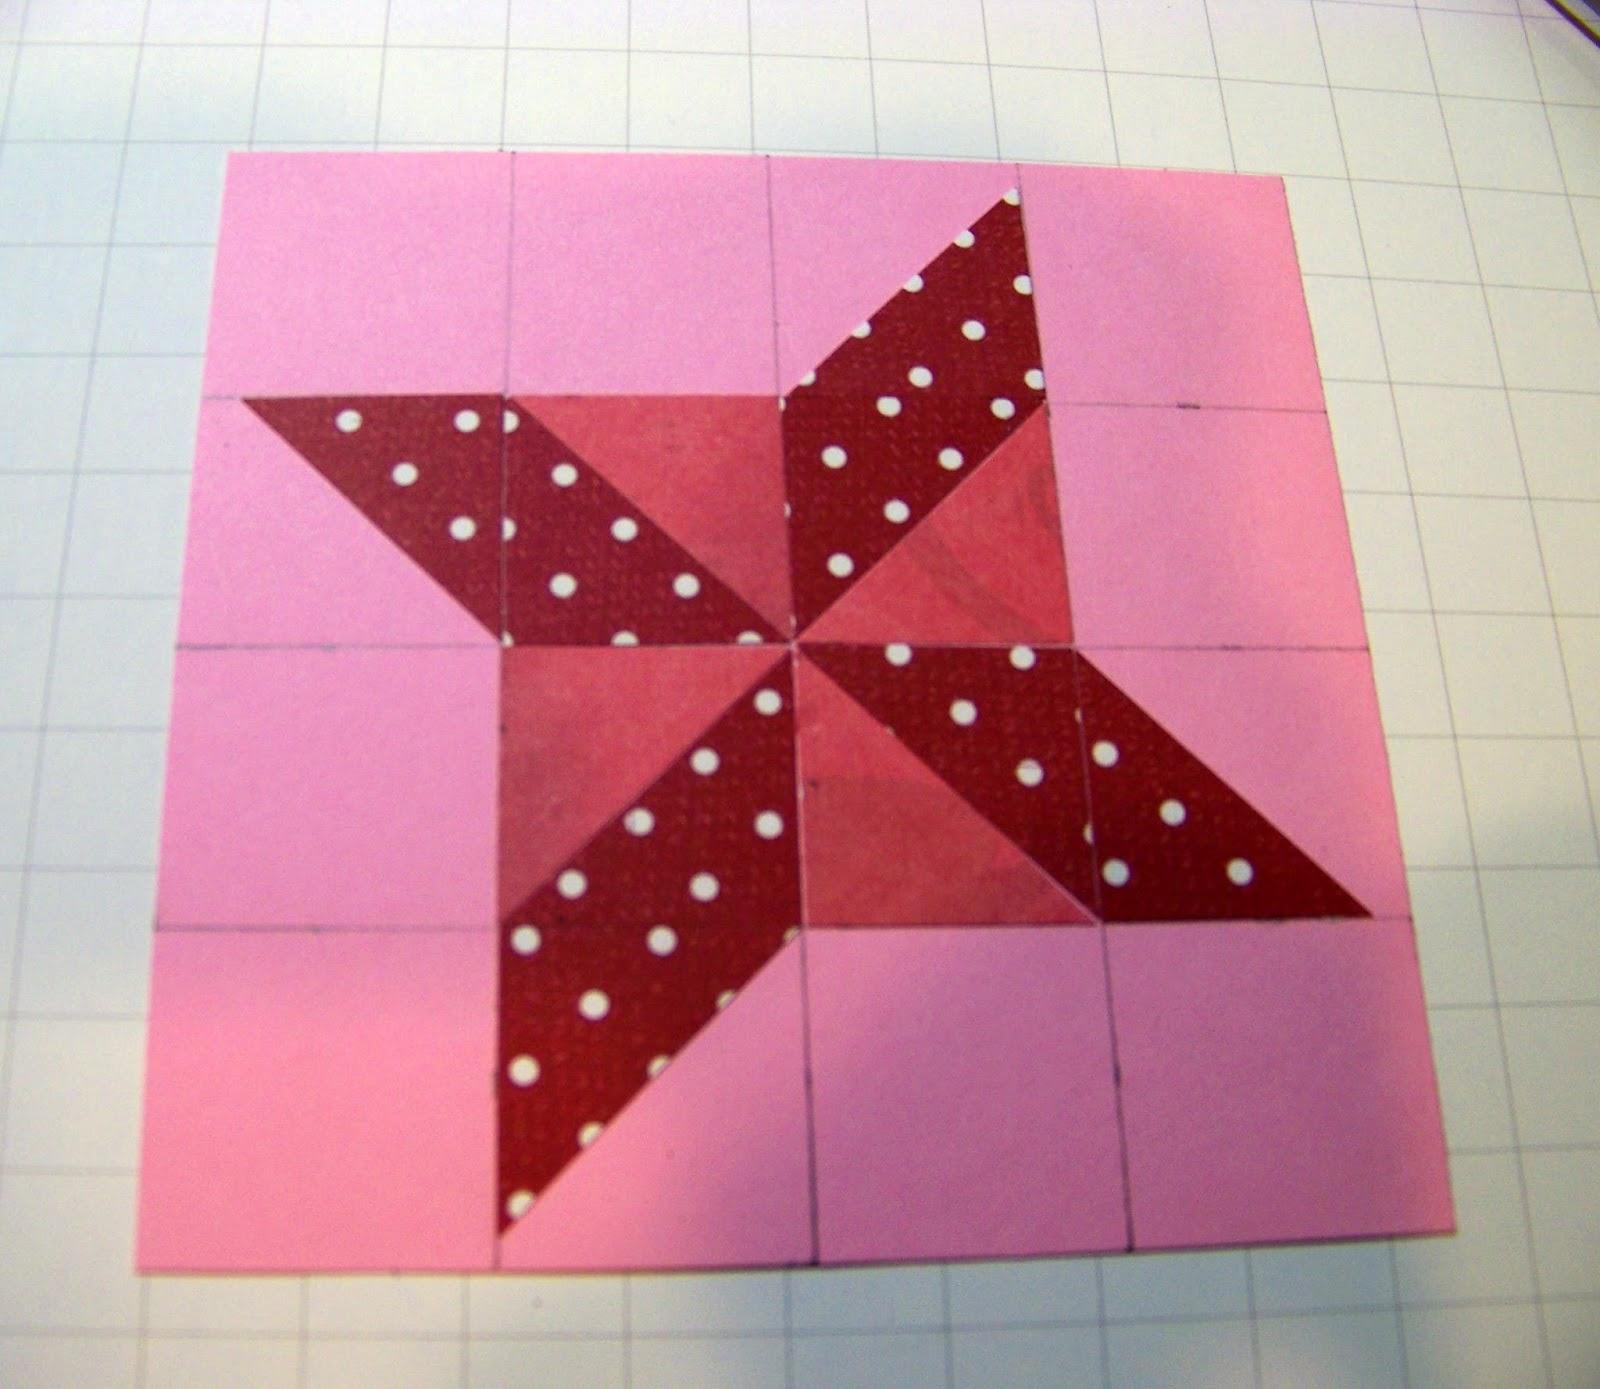 Ann Greenspan's Crafts: A Different Star Quilt Pattern with ... : parallelogram quilt pattern - Adamdwight.com